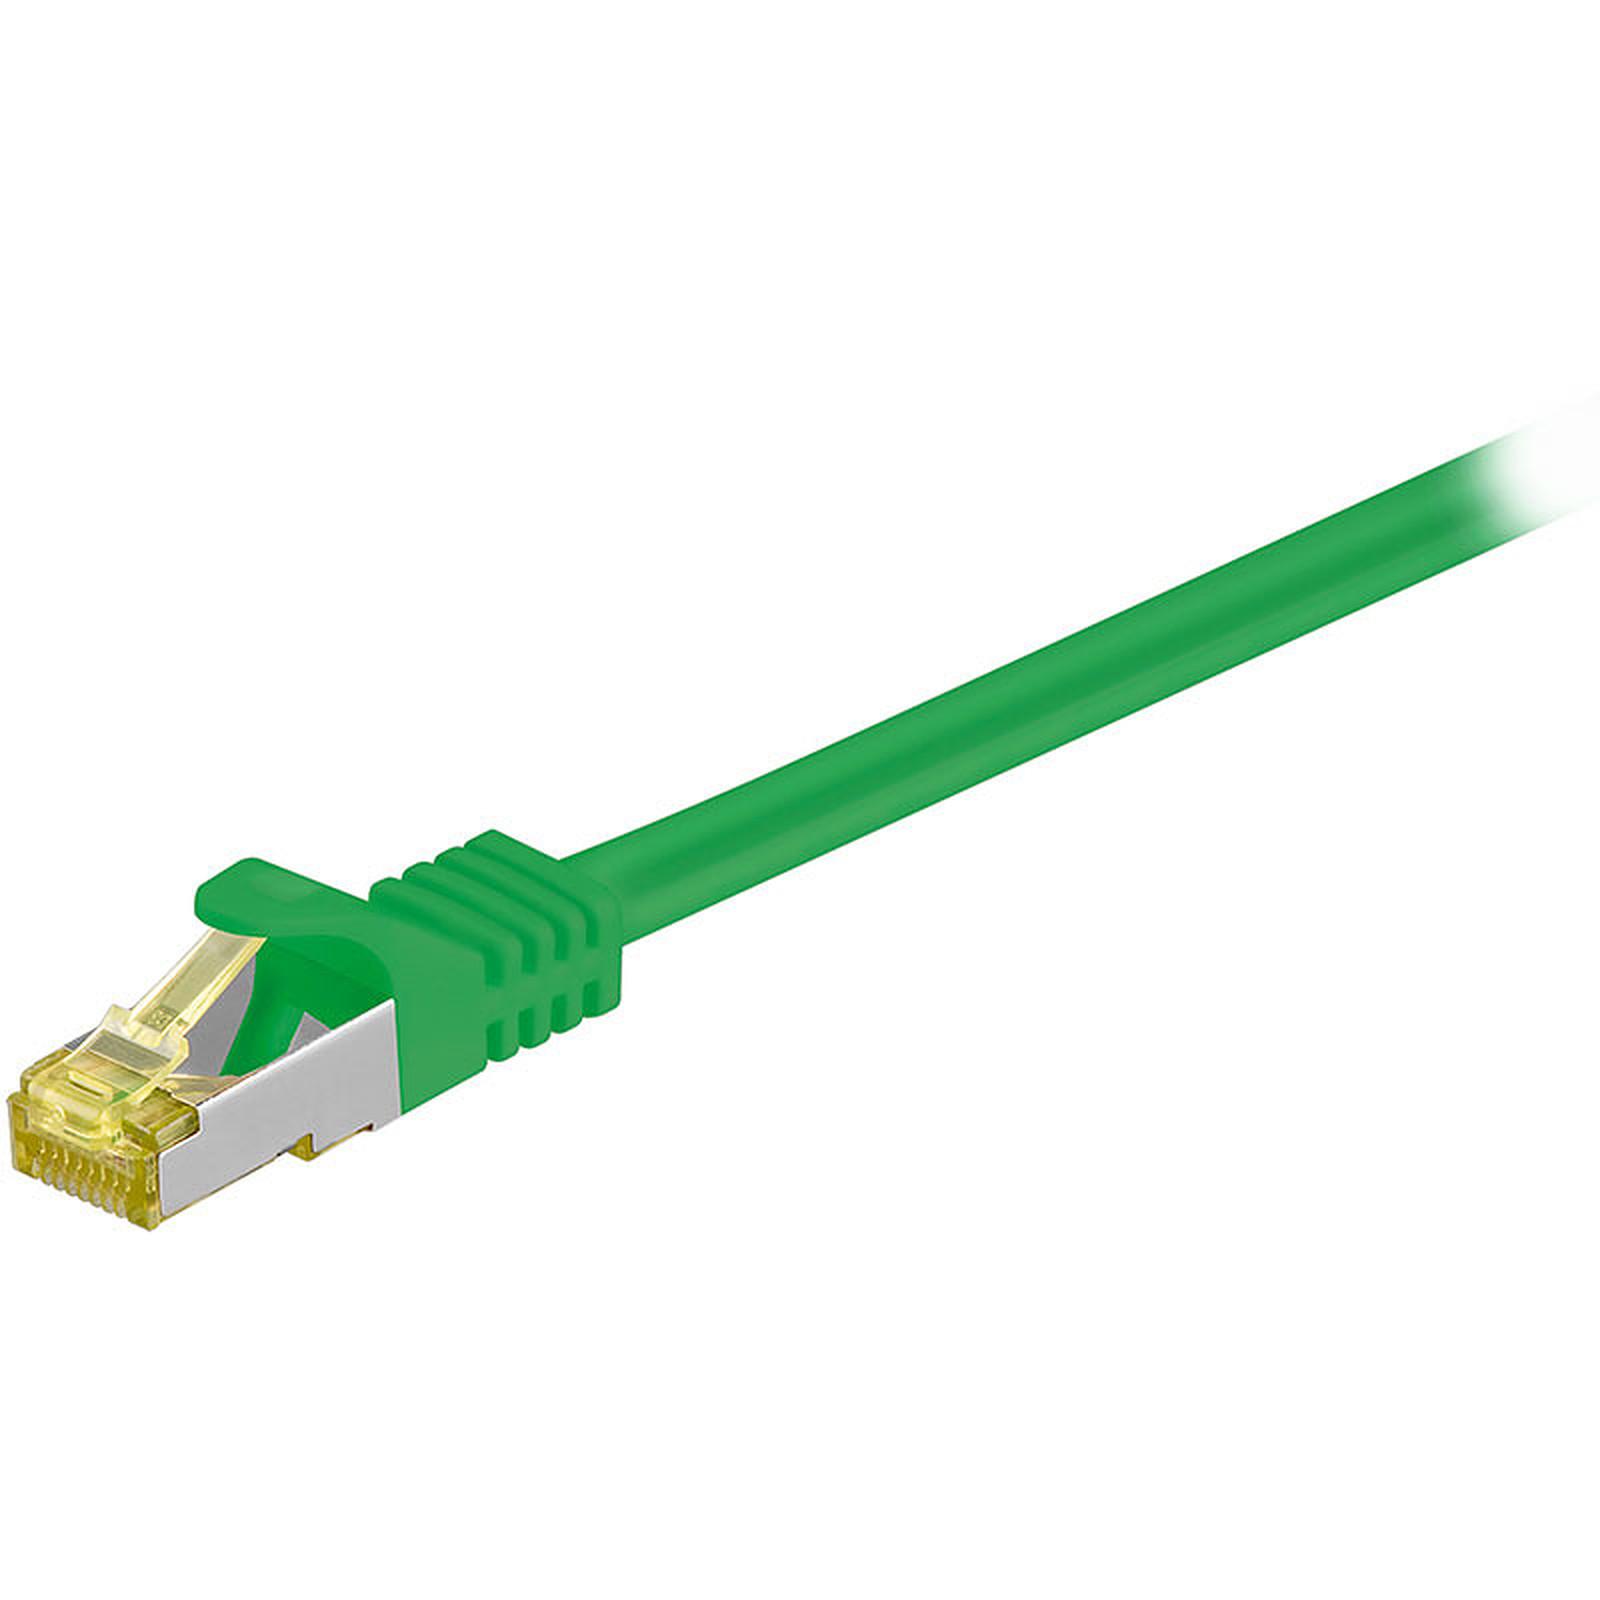 Cable RJ45 categoría 7 S/FTP 0,5 m (verde)